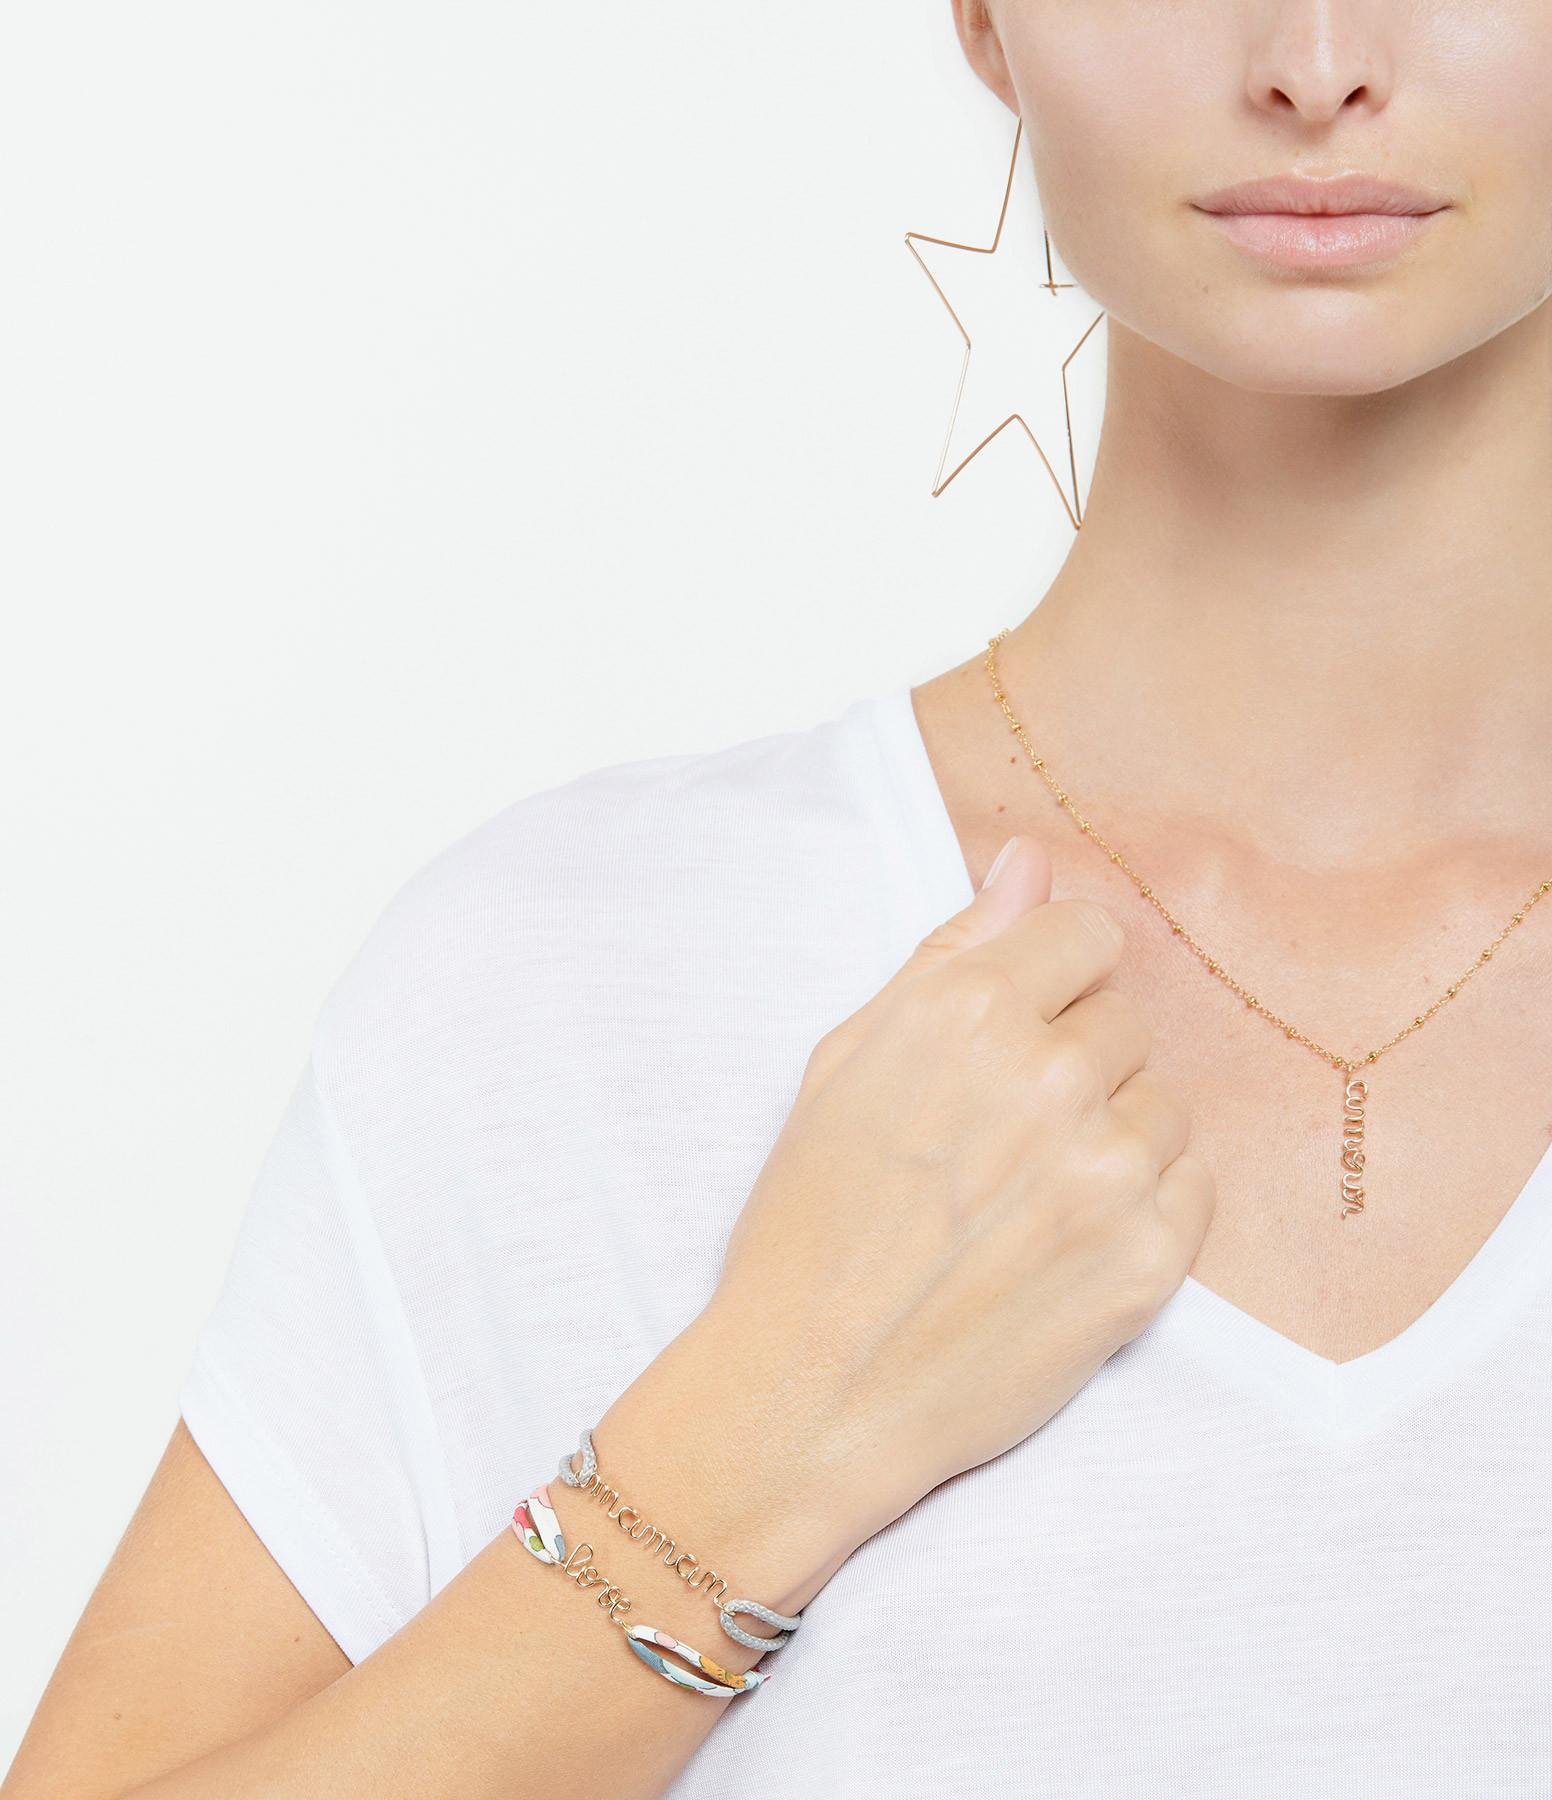 ATELIER PAULIN - Bracelet Cordon Ciré Maman Gold Filled